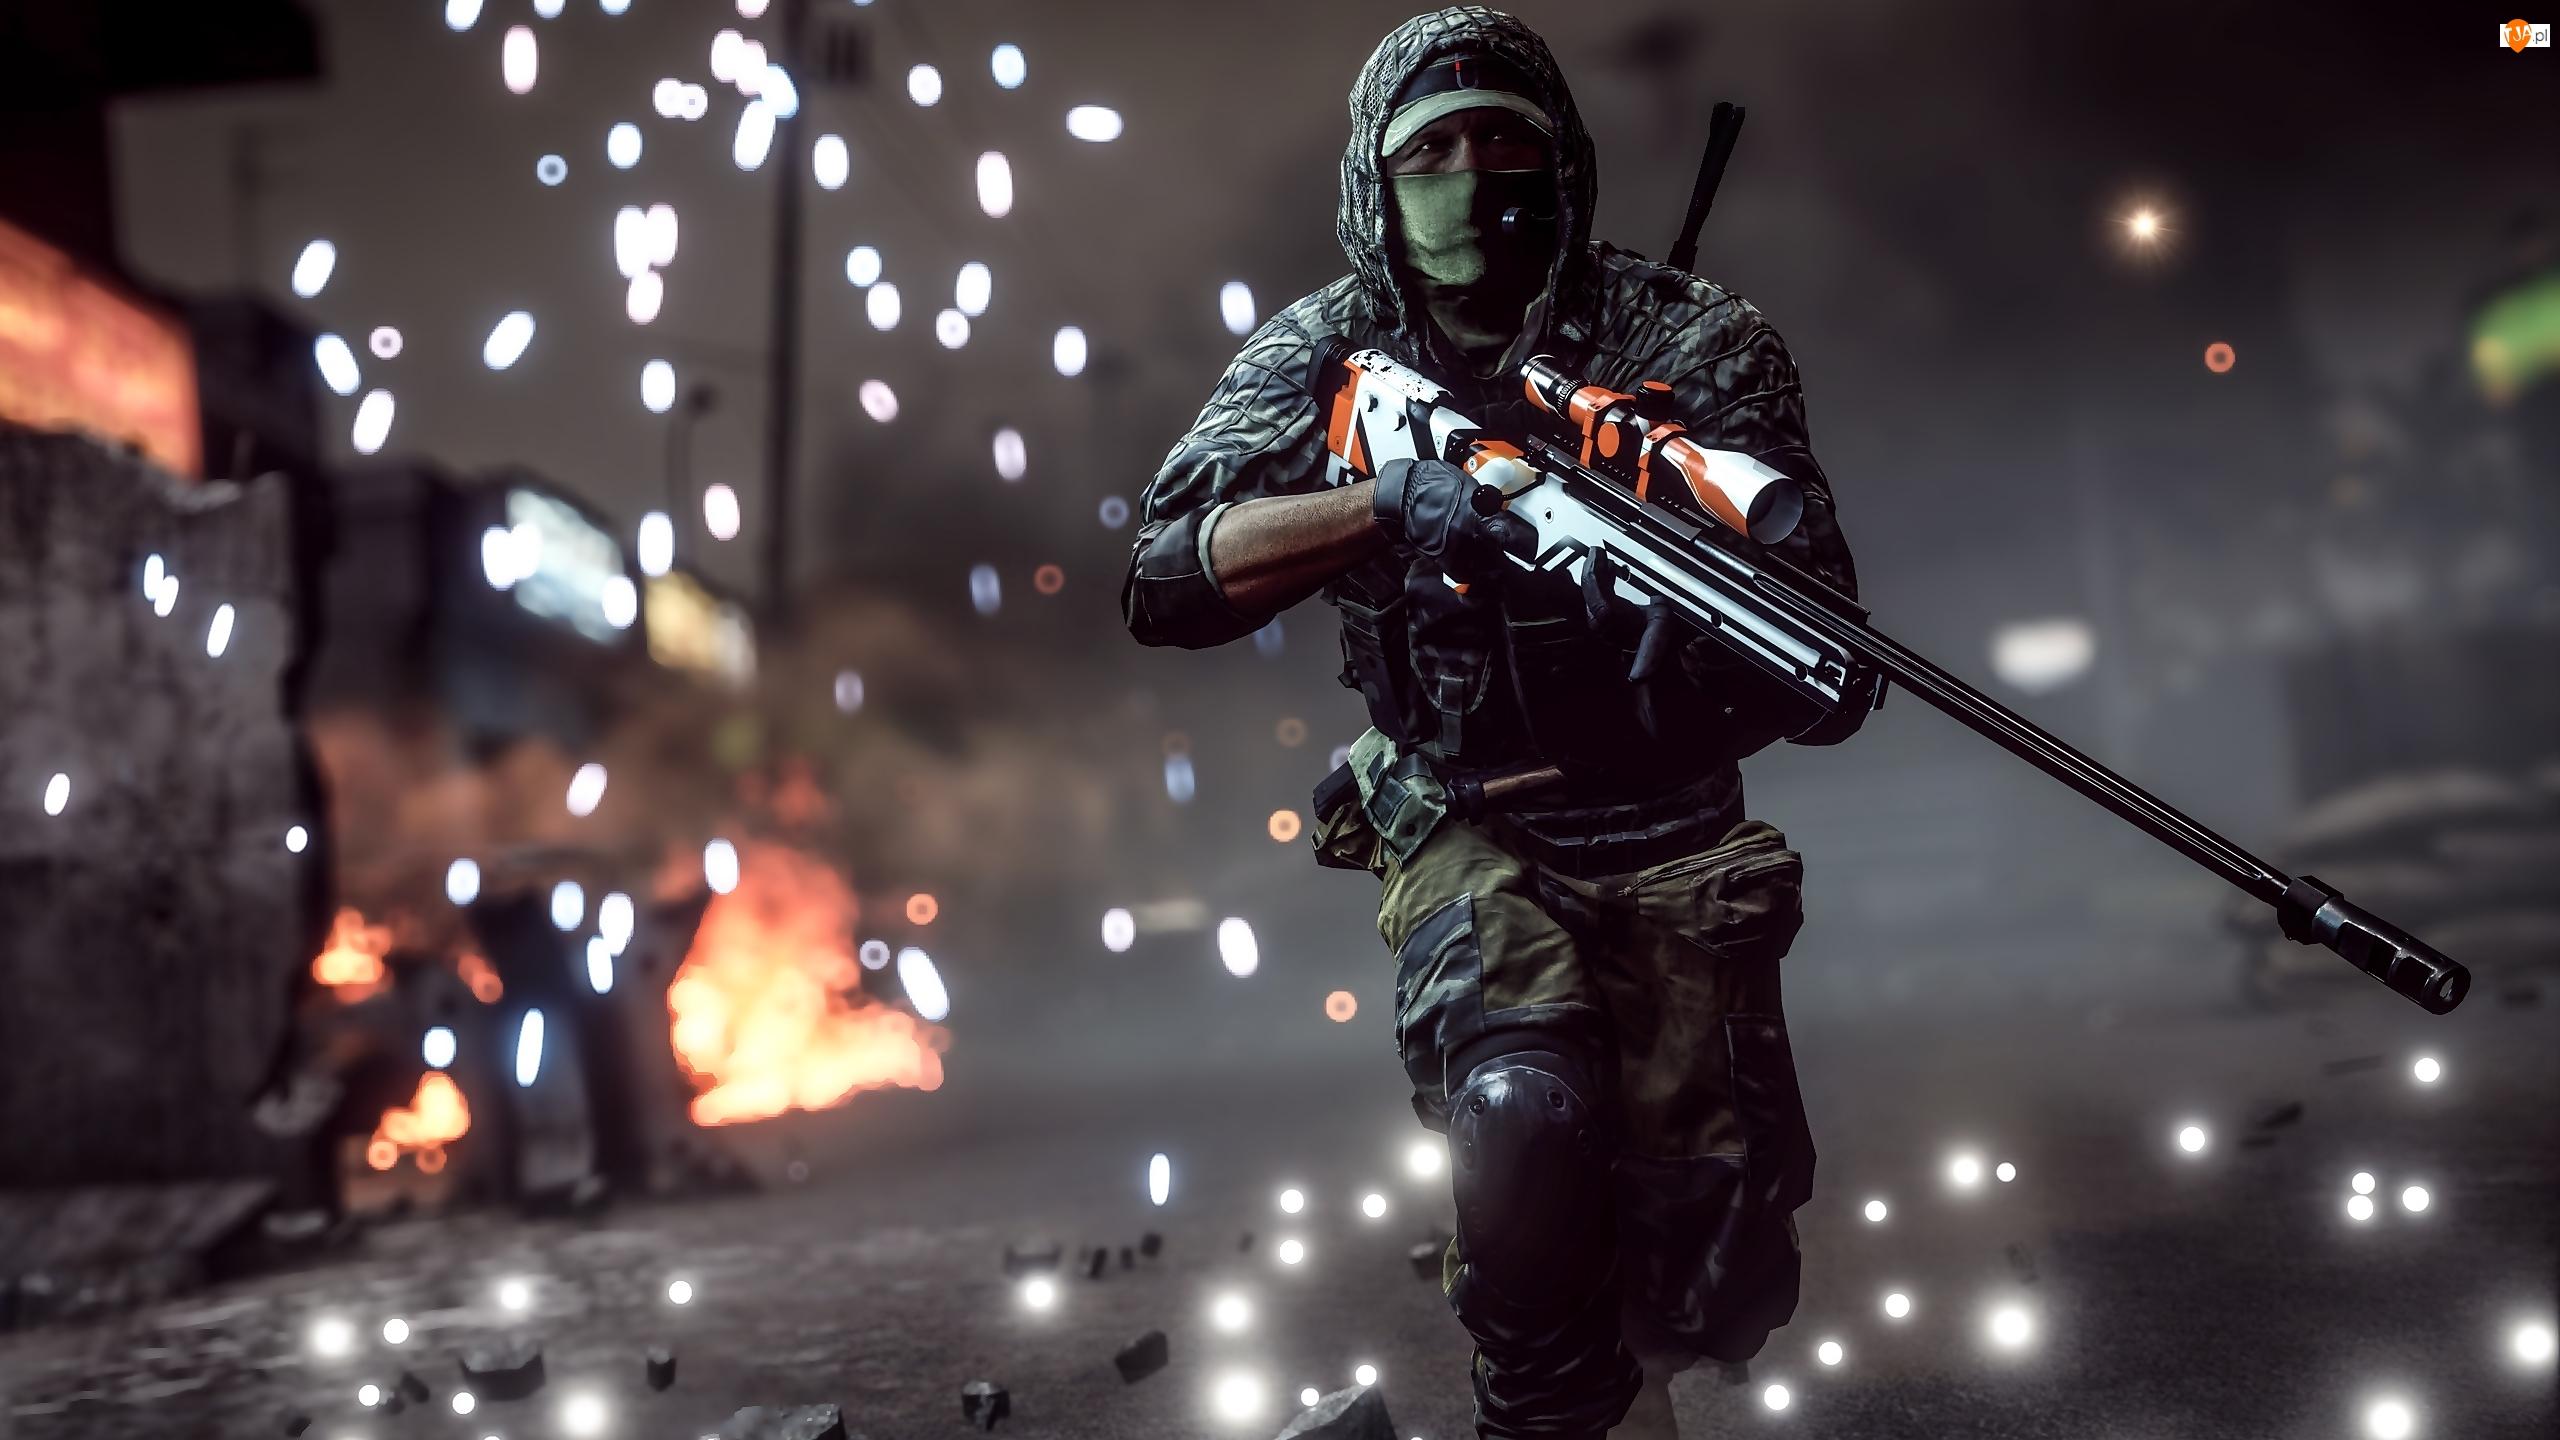 Gra, Snajper, Battlefield 4, Żołnierz